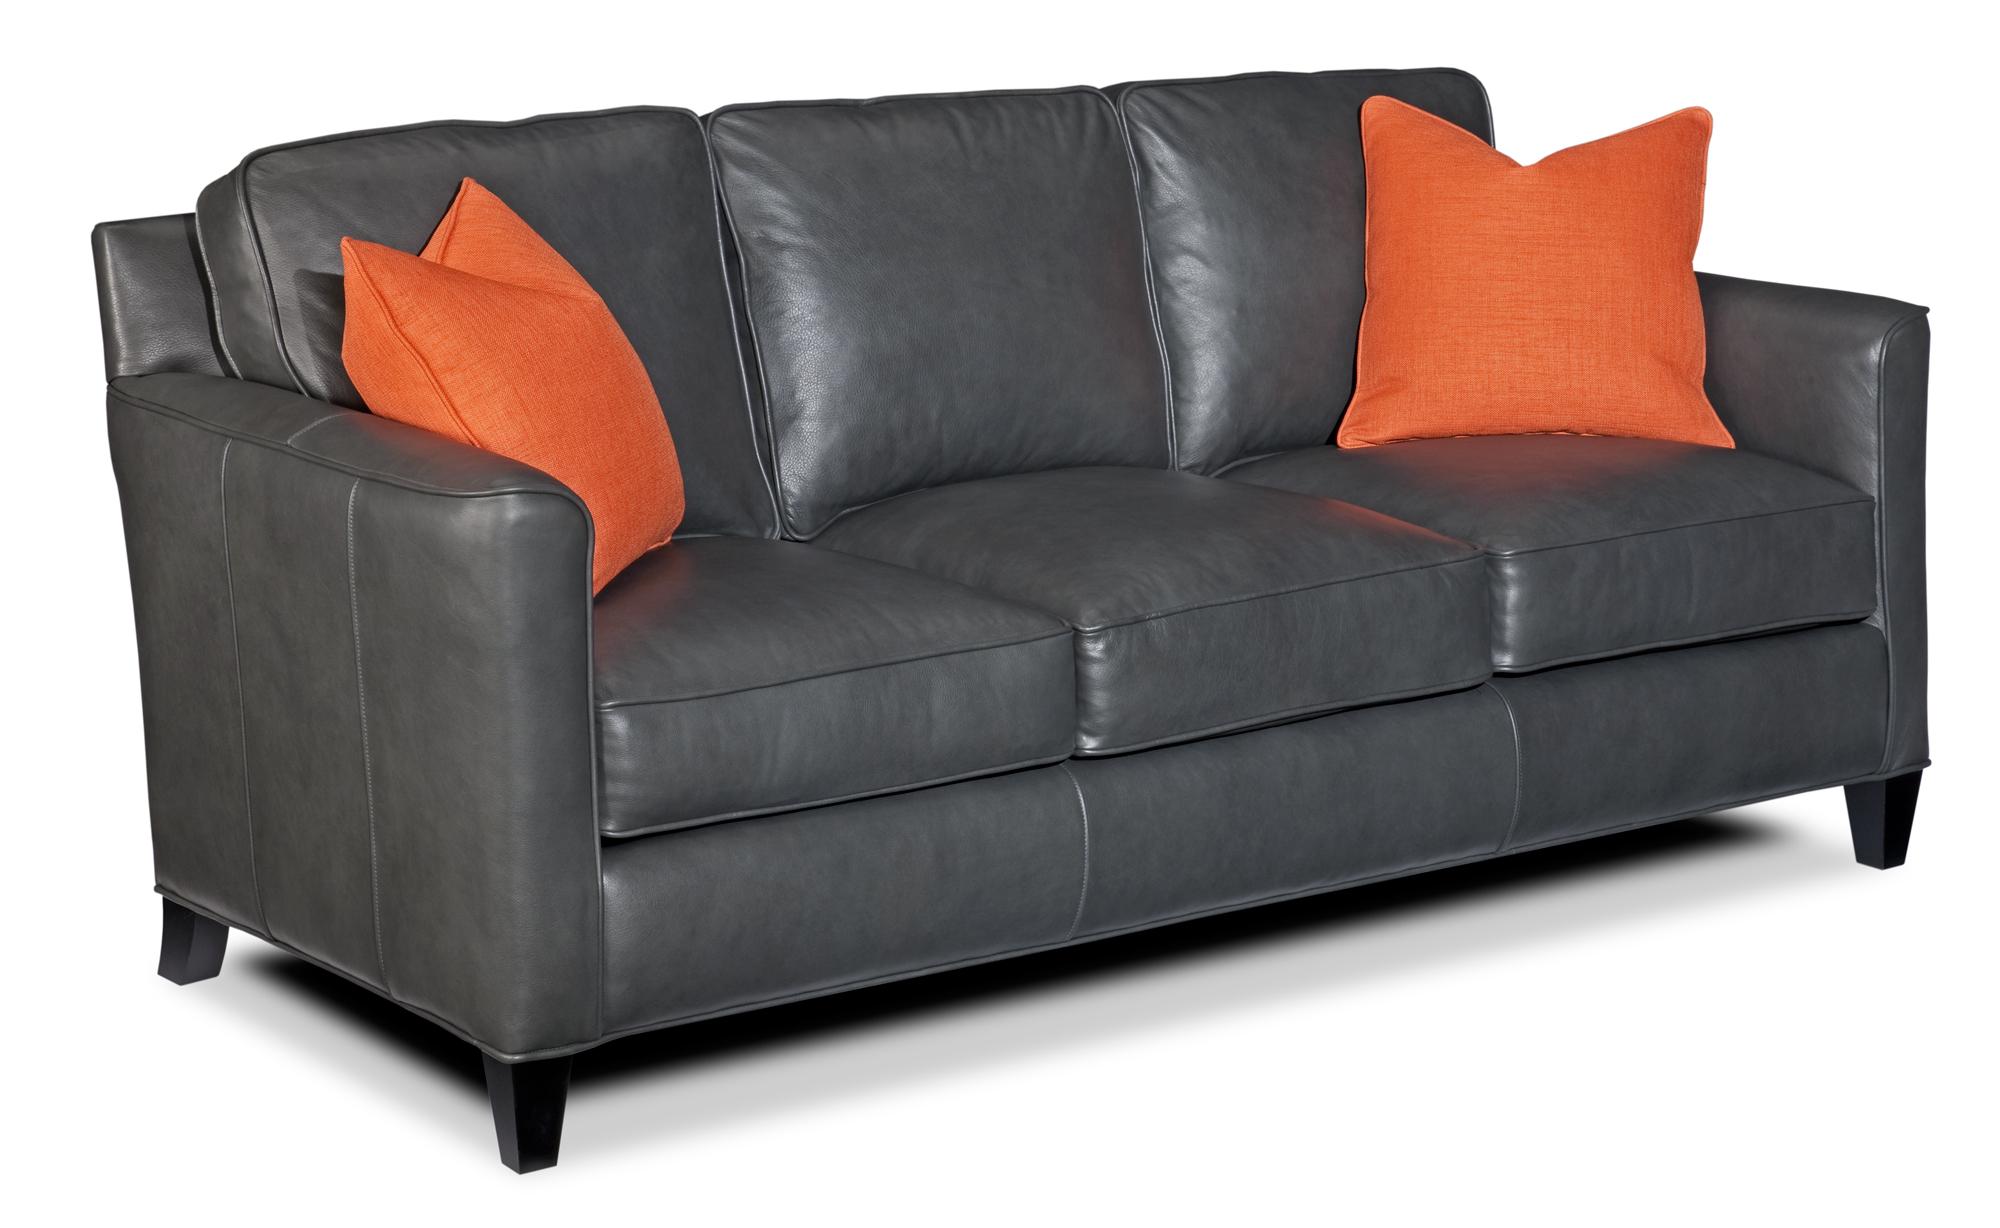 sofa photography - Sample Furniture